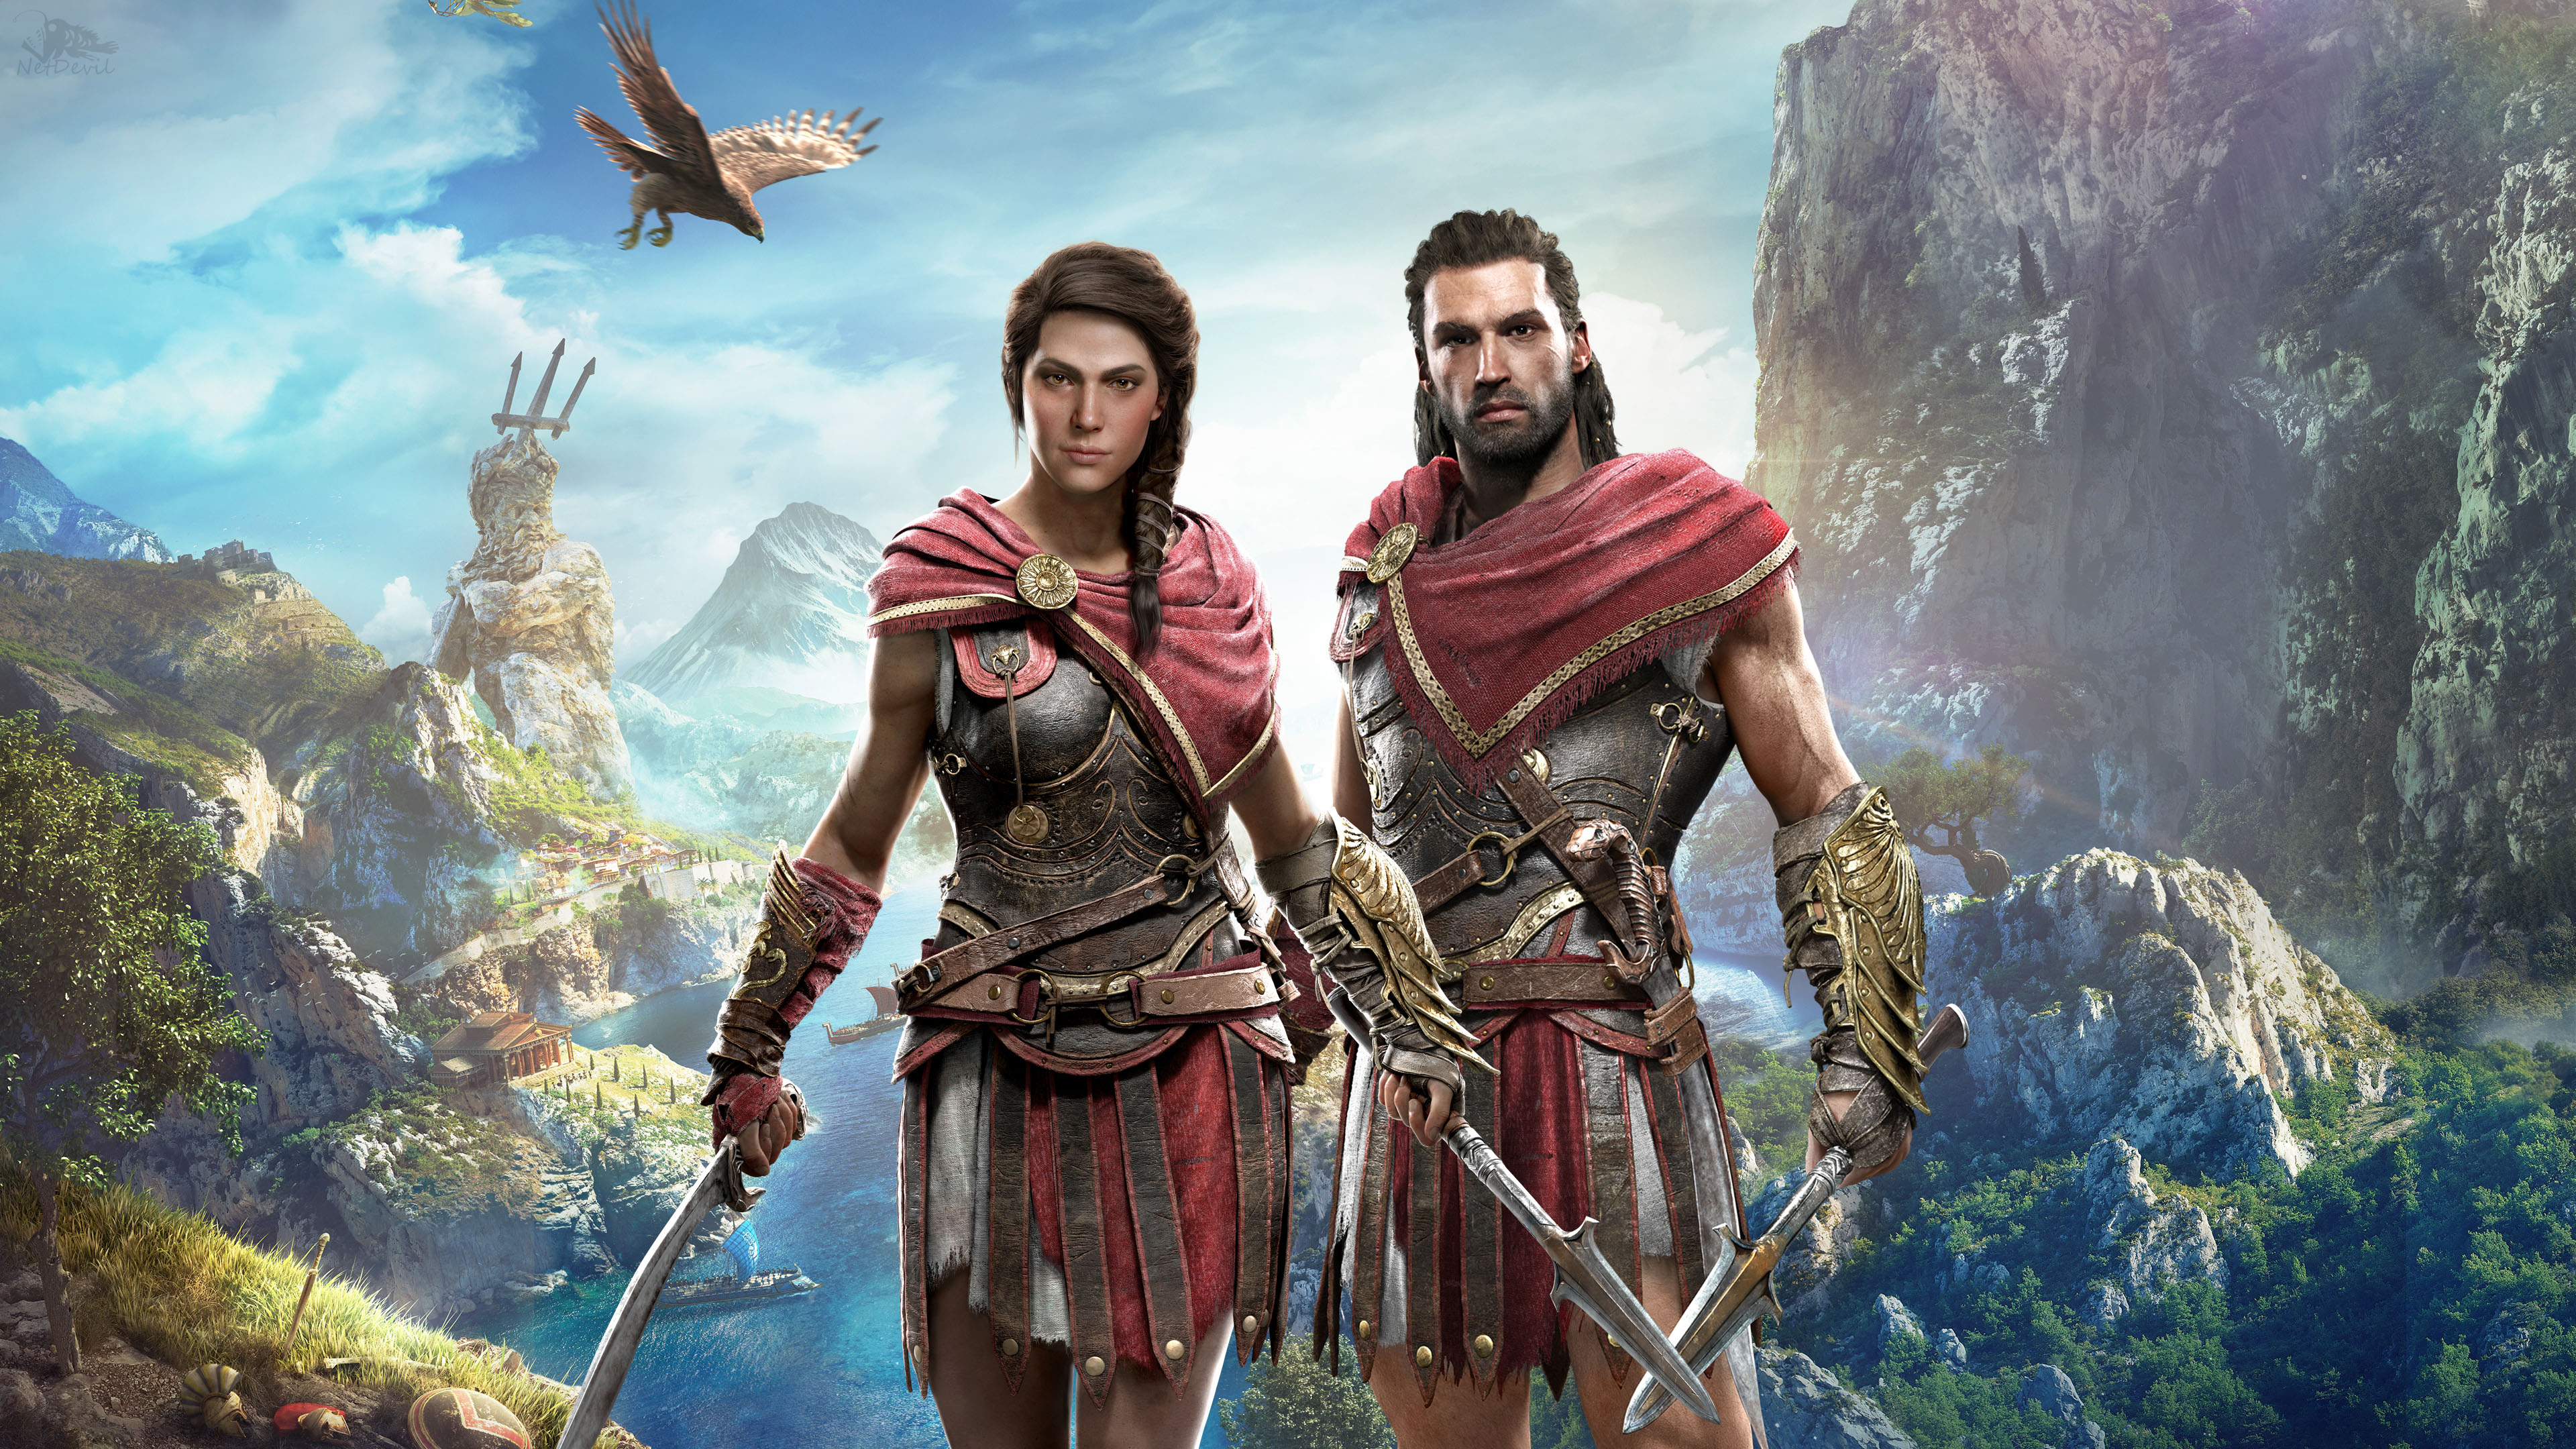 Hd Wallpapers Assassins Creed Kassandra 4k 8k Hd Assassin S Creed Wallpaper